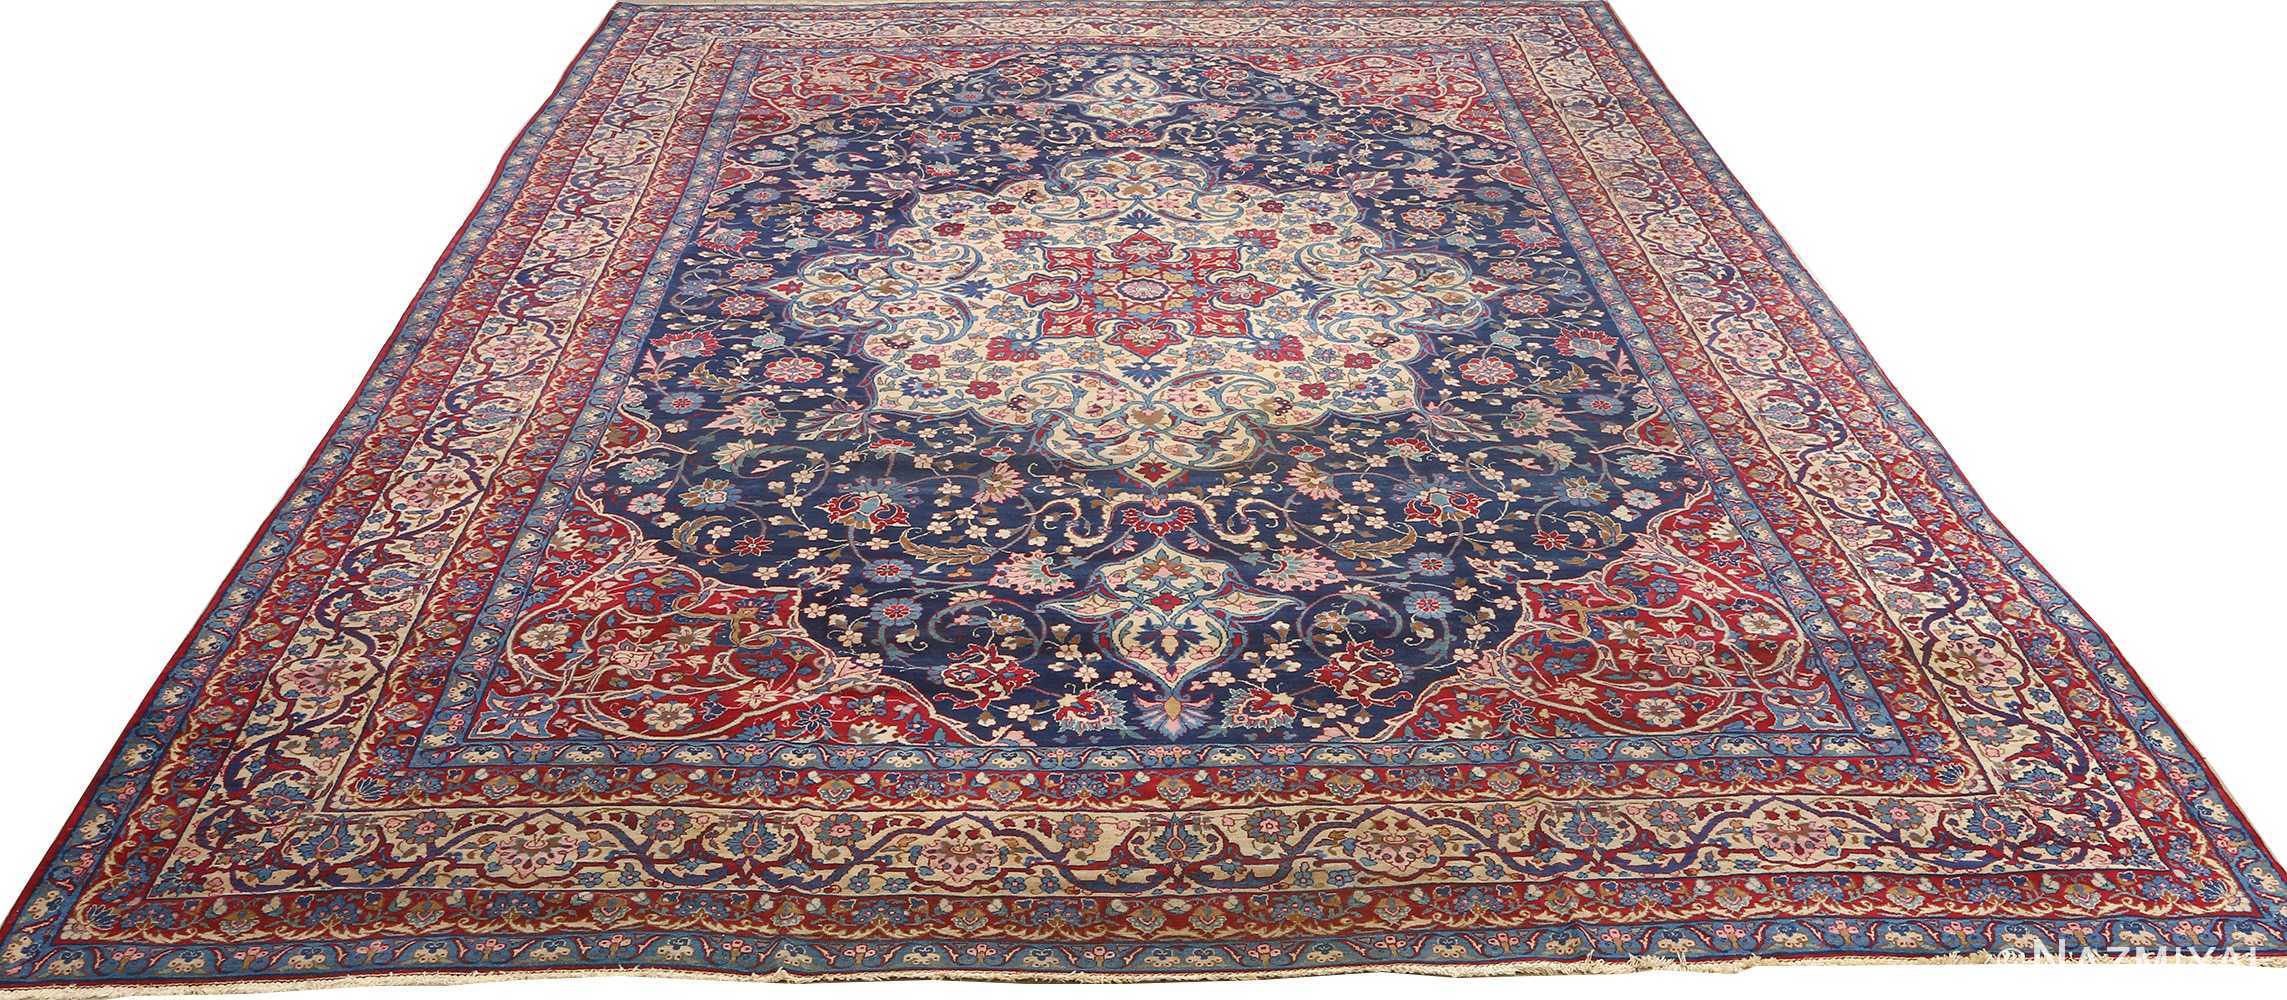 antique blue bakground isfahan persian rug 51066 full white Nazmiyal